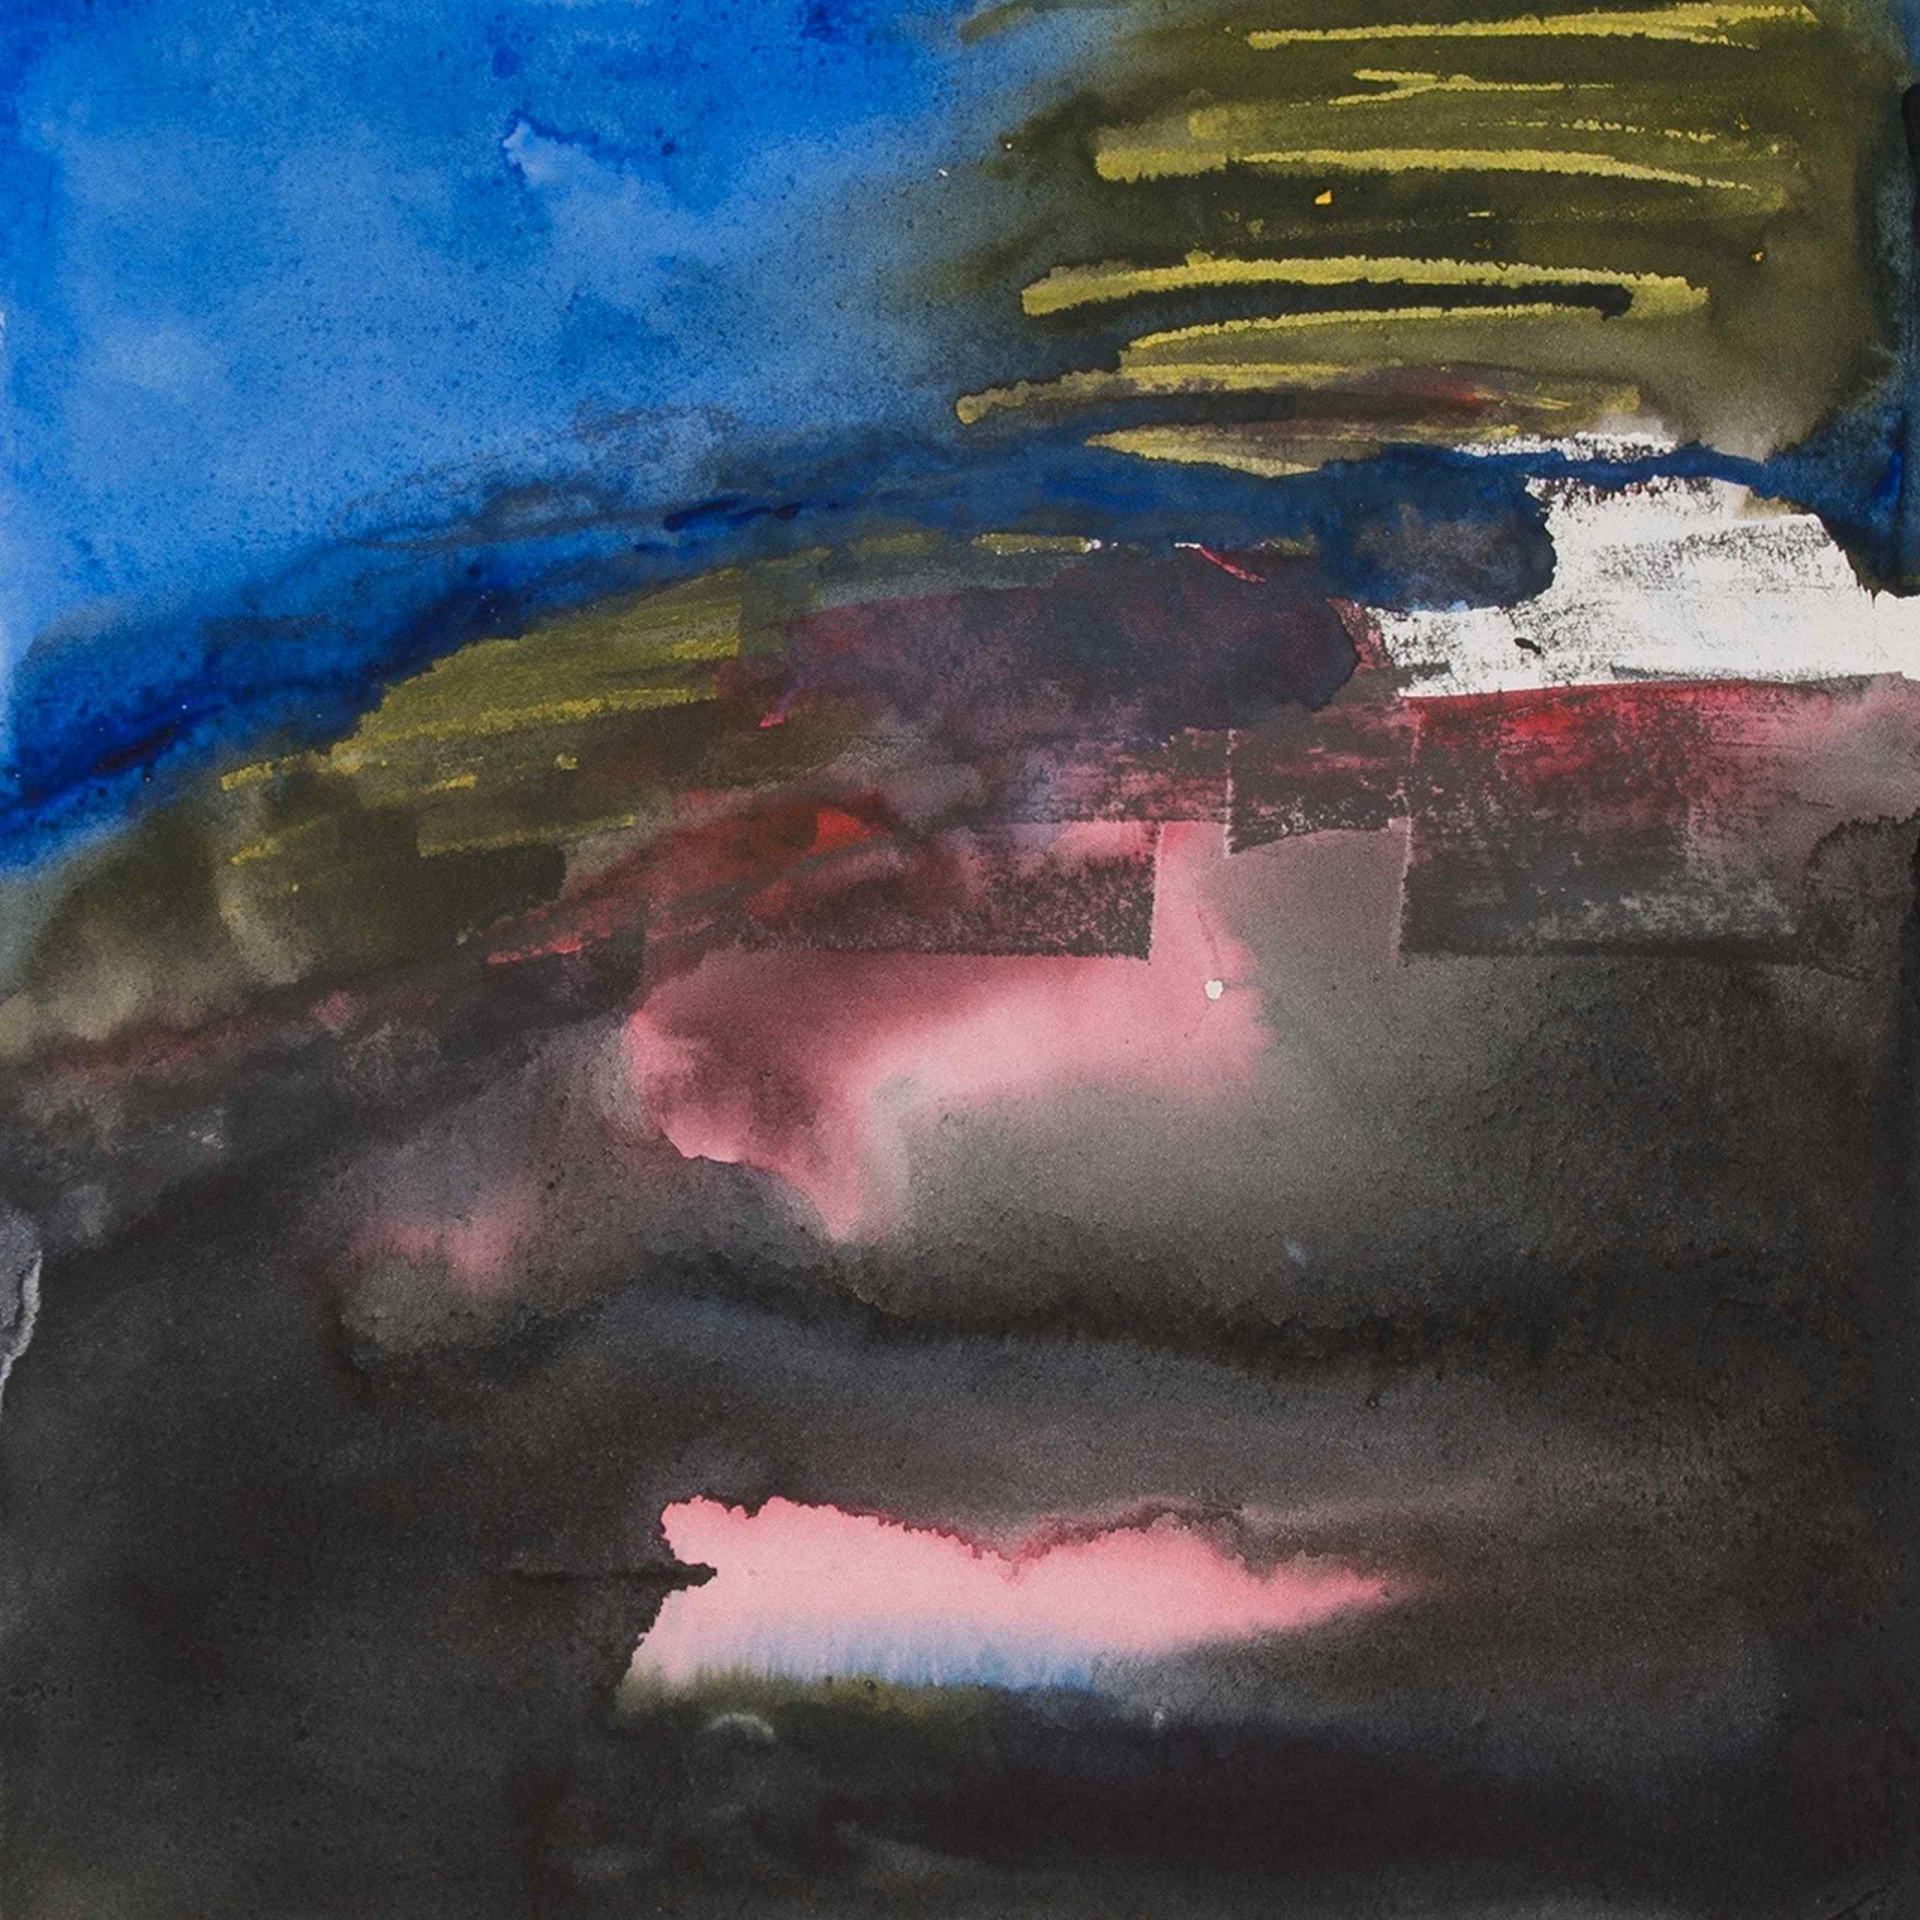 Juist 5 - Aquarell von Eva Doelker-Heim